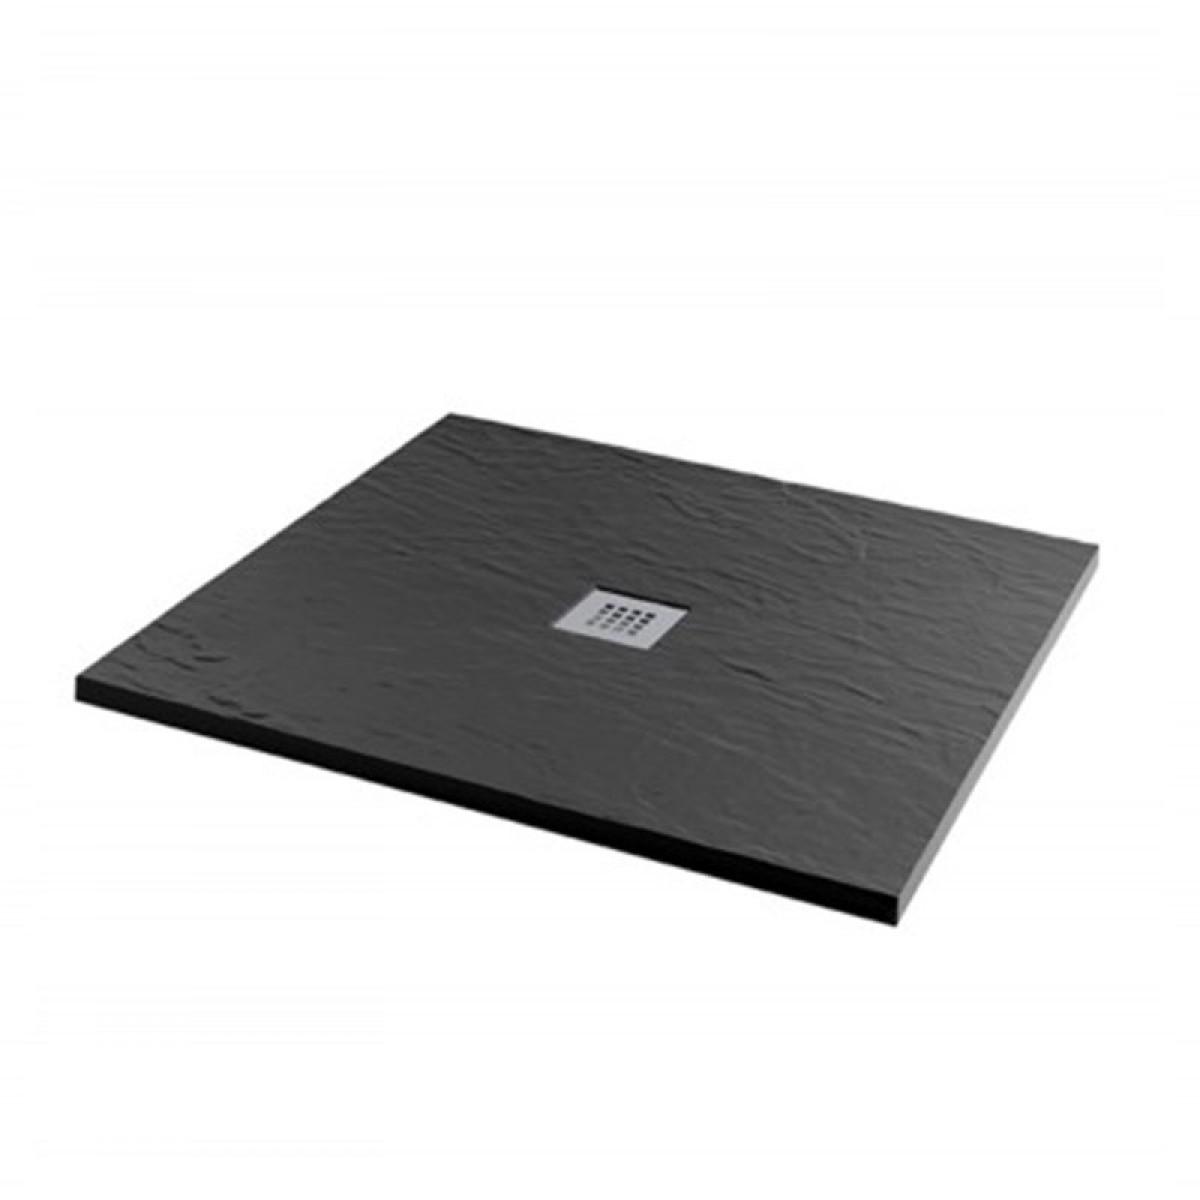 mx minerals 1000 x 1000mm square jet black shower tray x2s. Black Bedroom Furniture Sets. Home Design Ideas